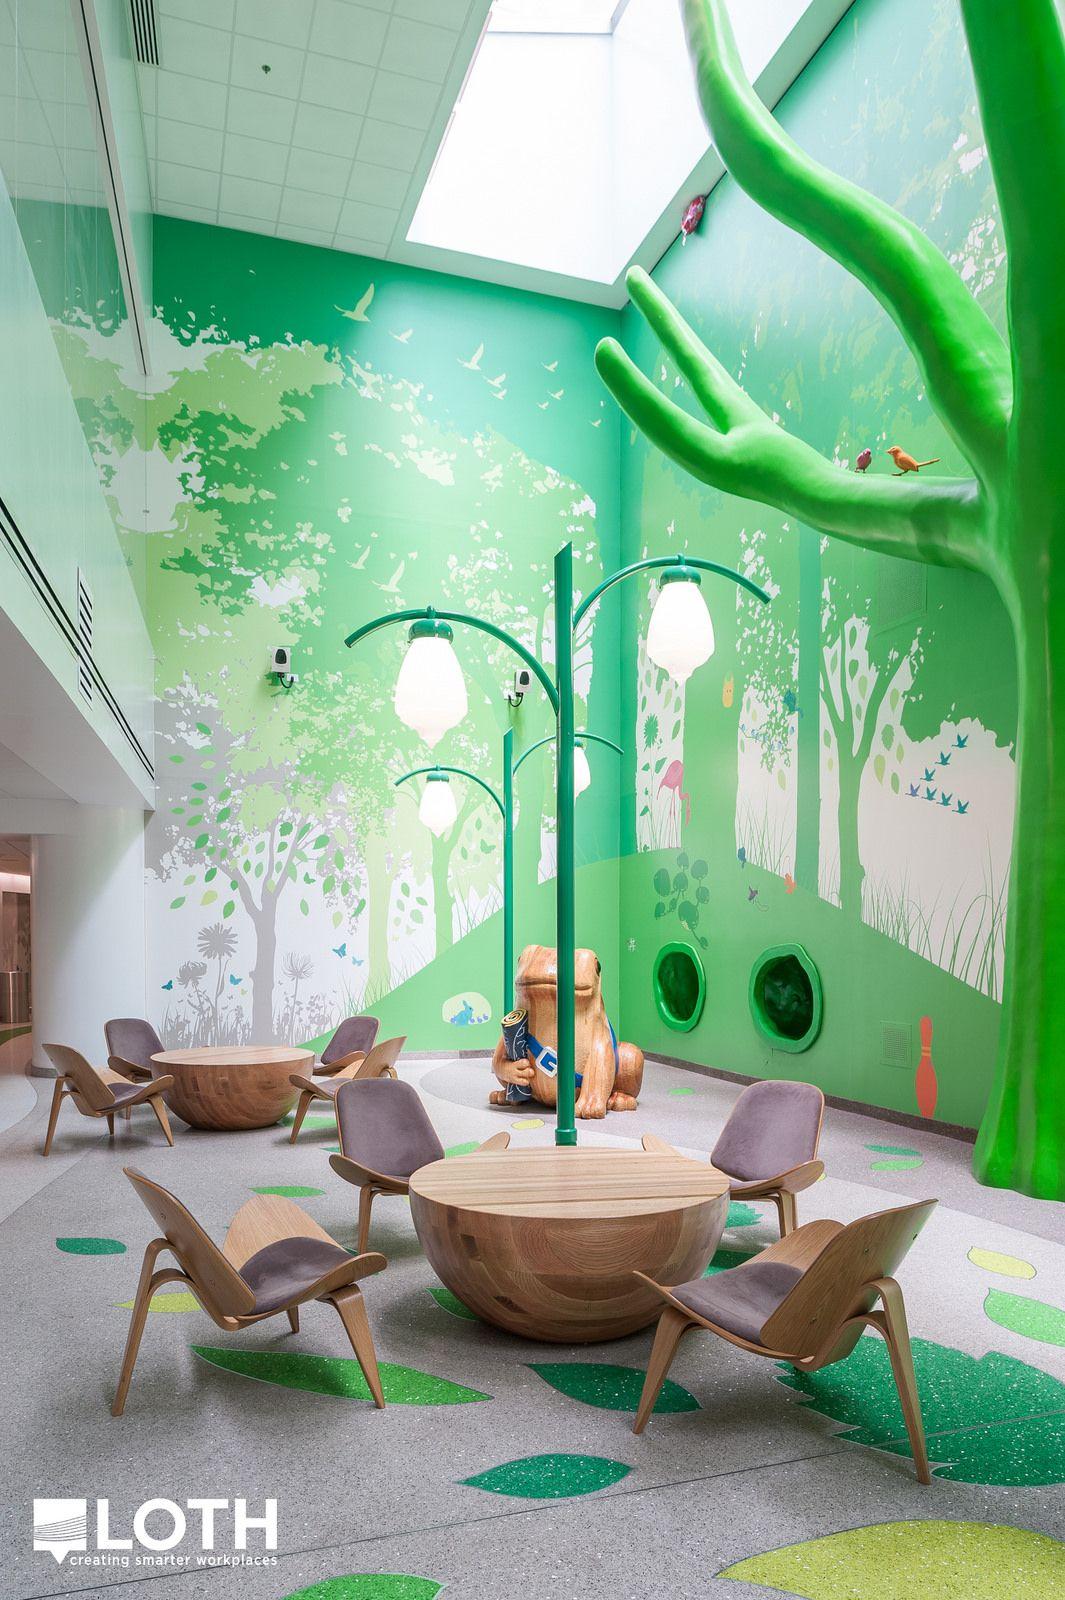 Hospital Room Interior Design: Nationwide Children's Hospital